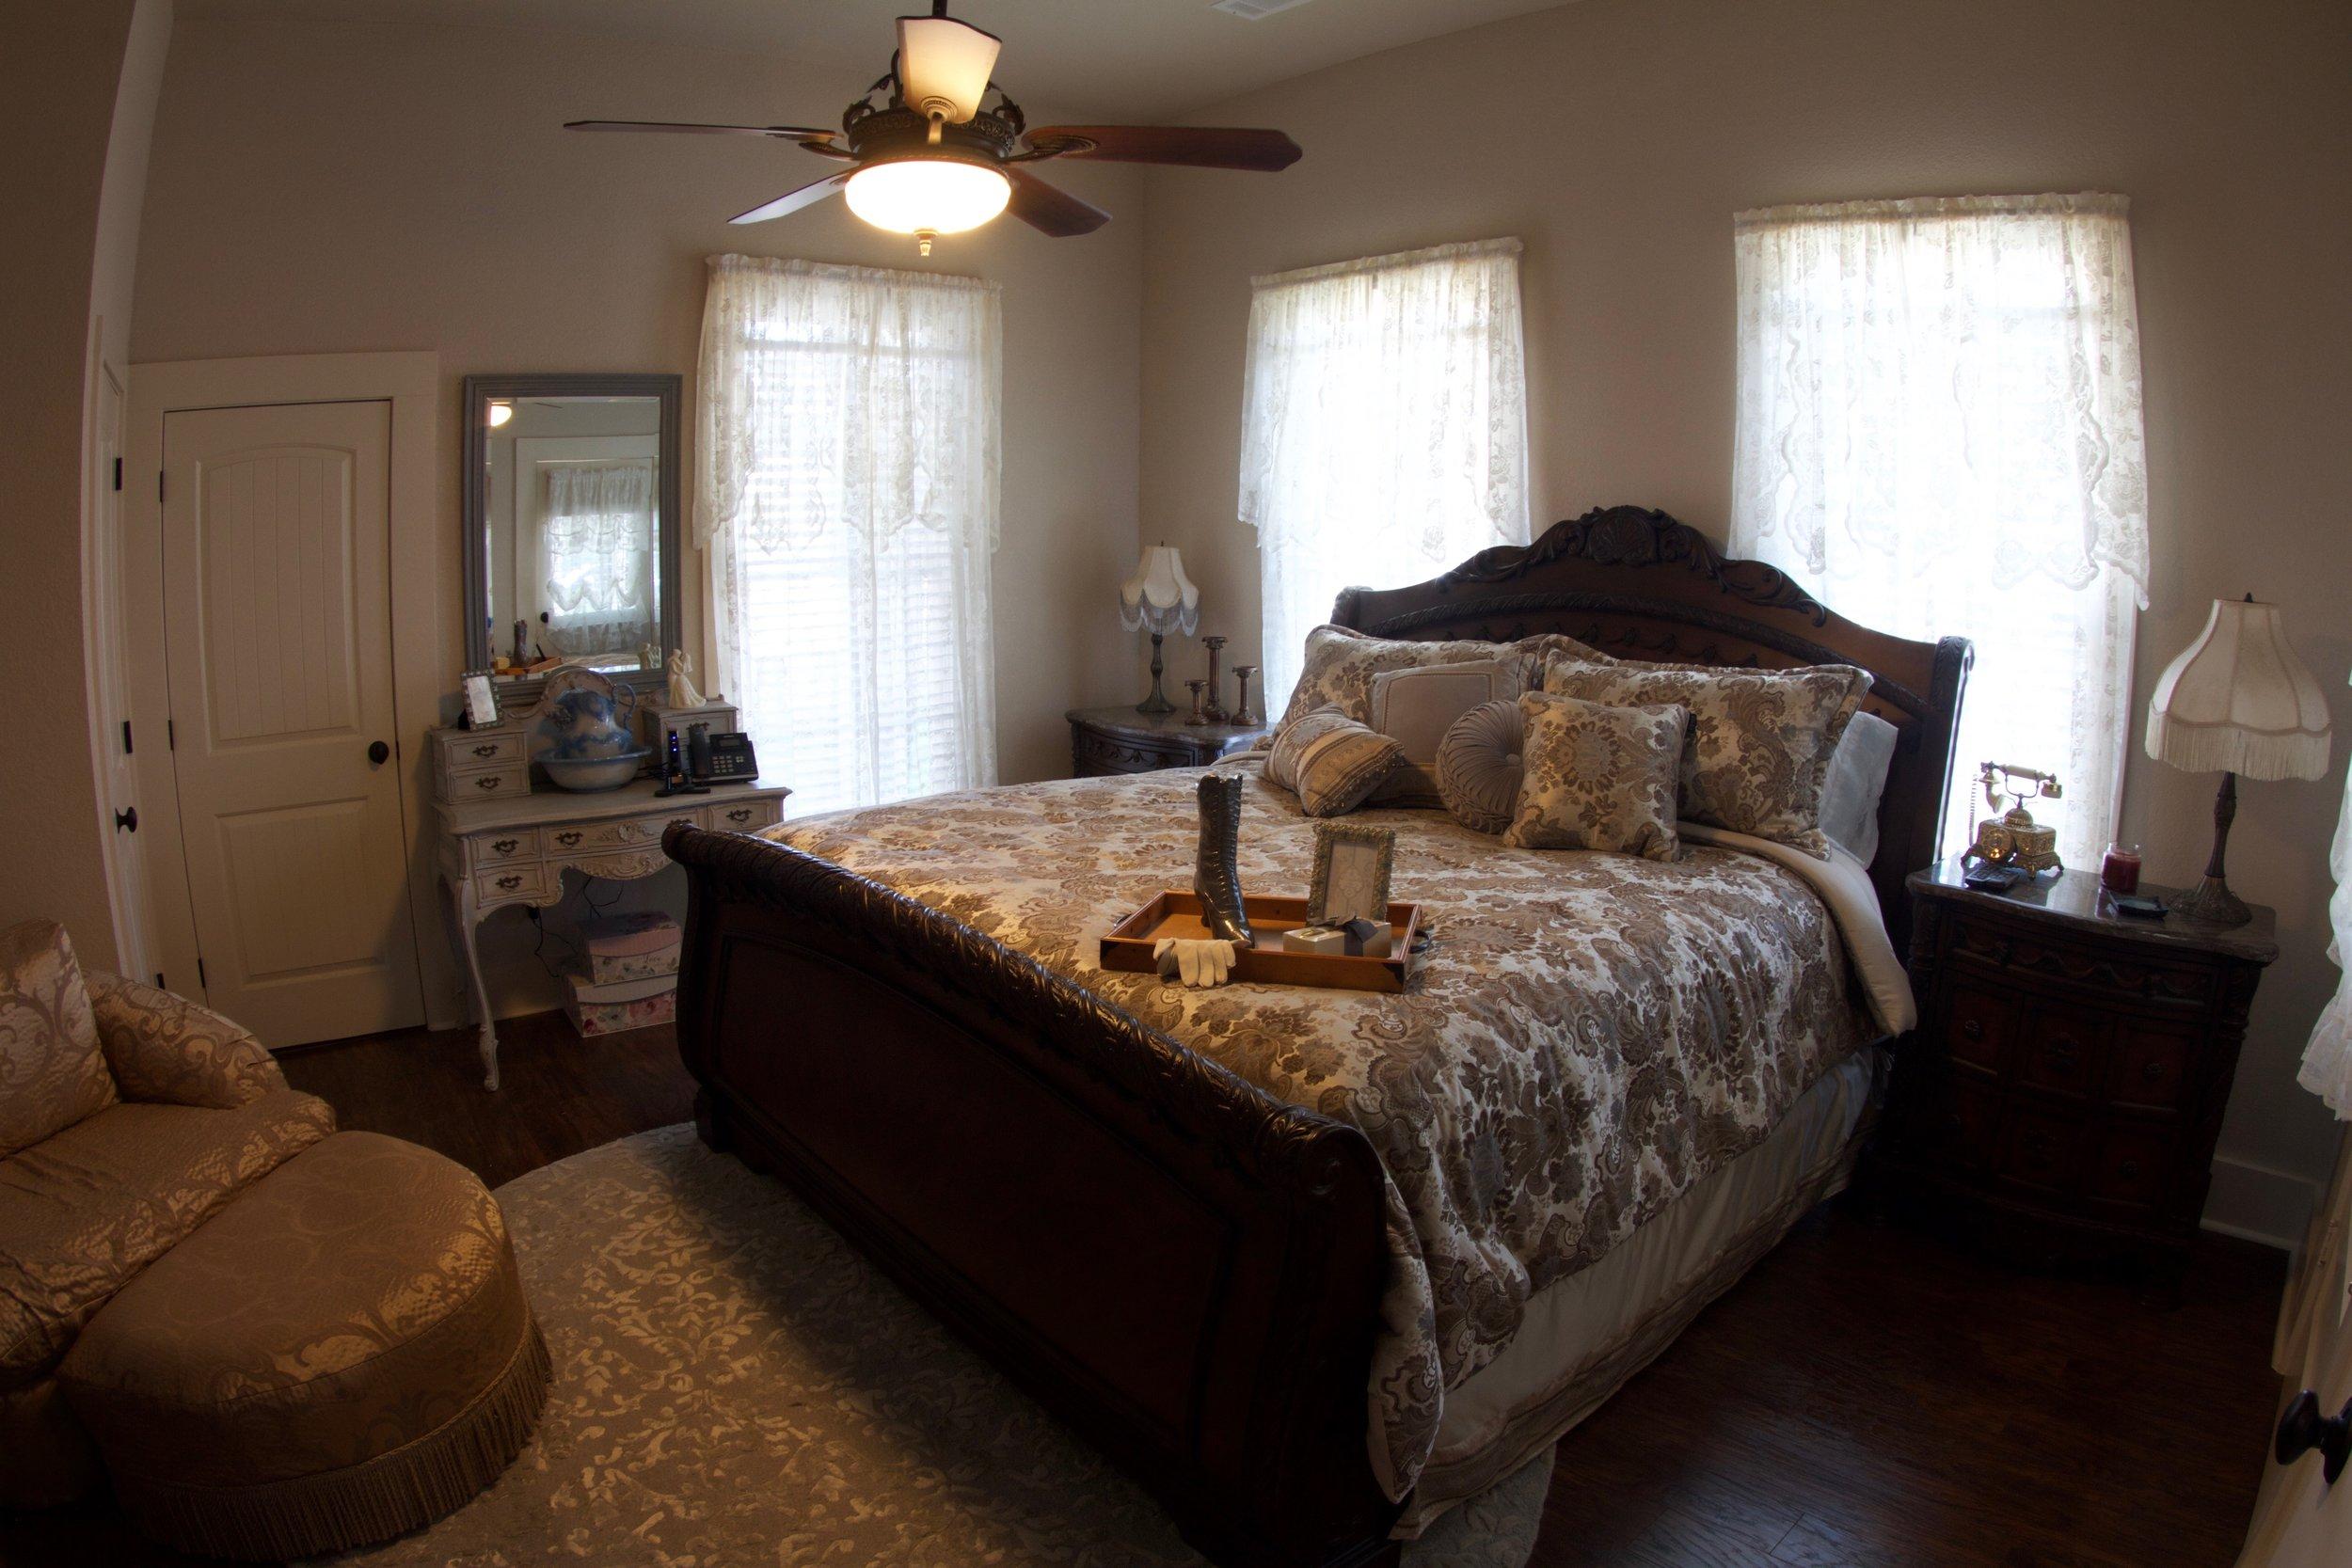 Big House_King Alexandar bed 1.jpg